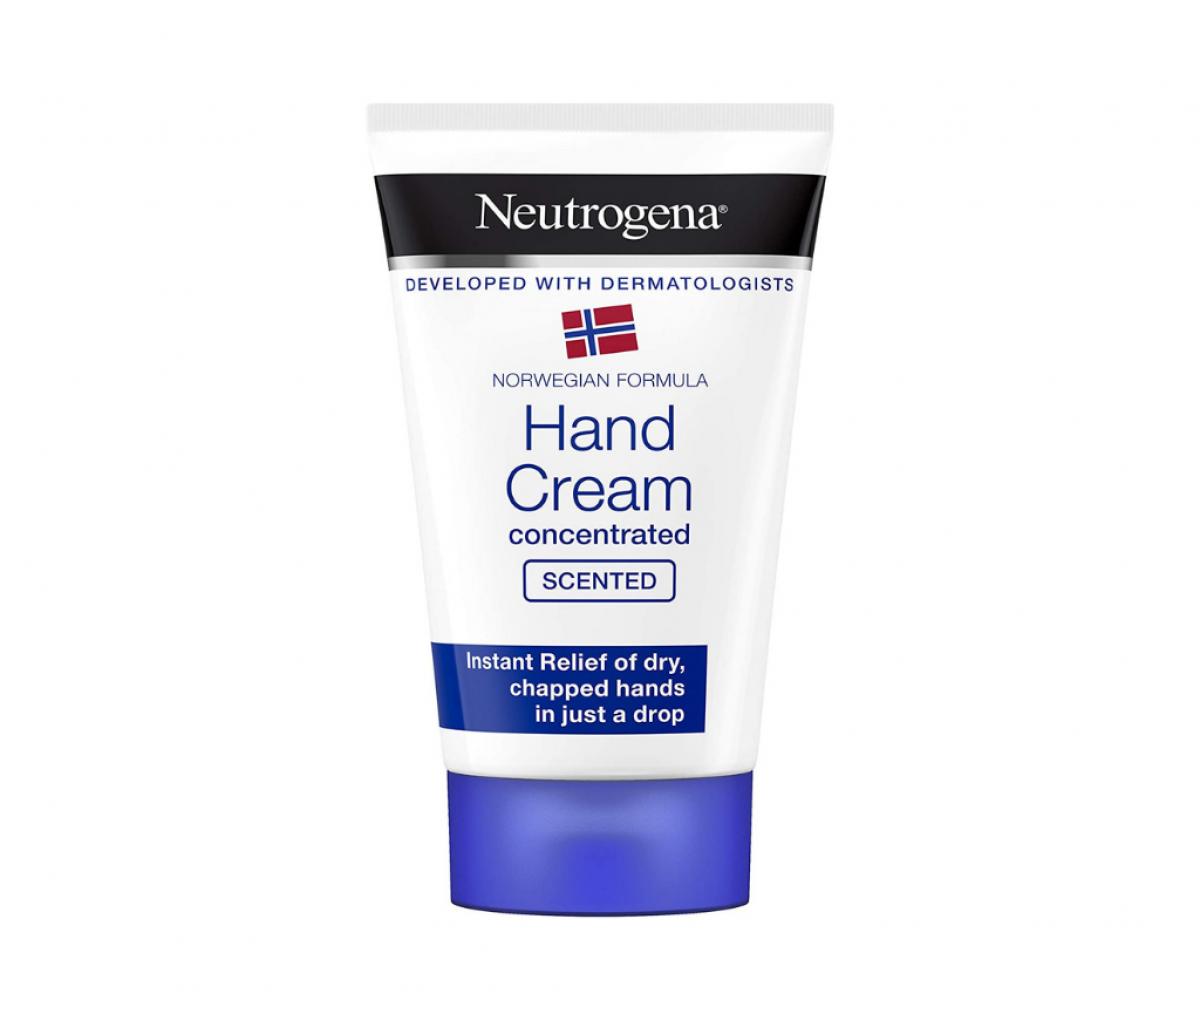 Neutrogena 50ml scented hand cream